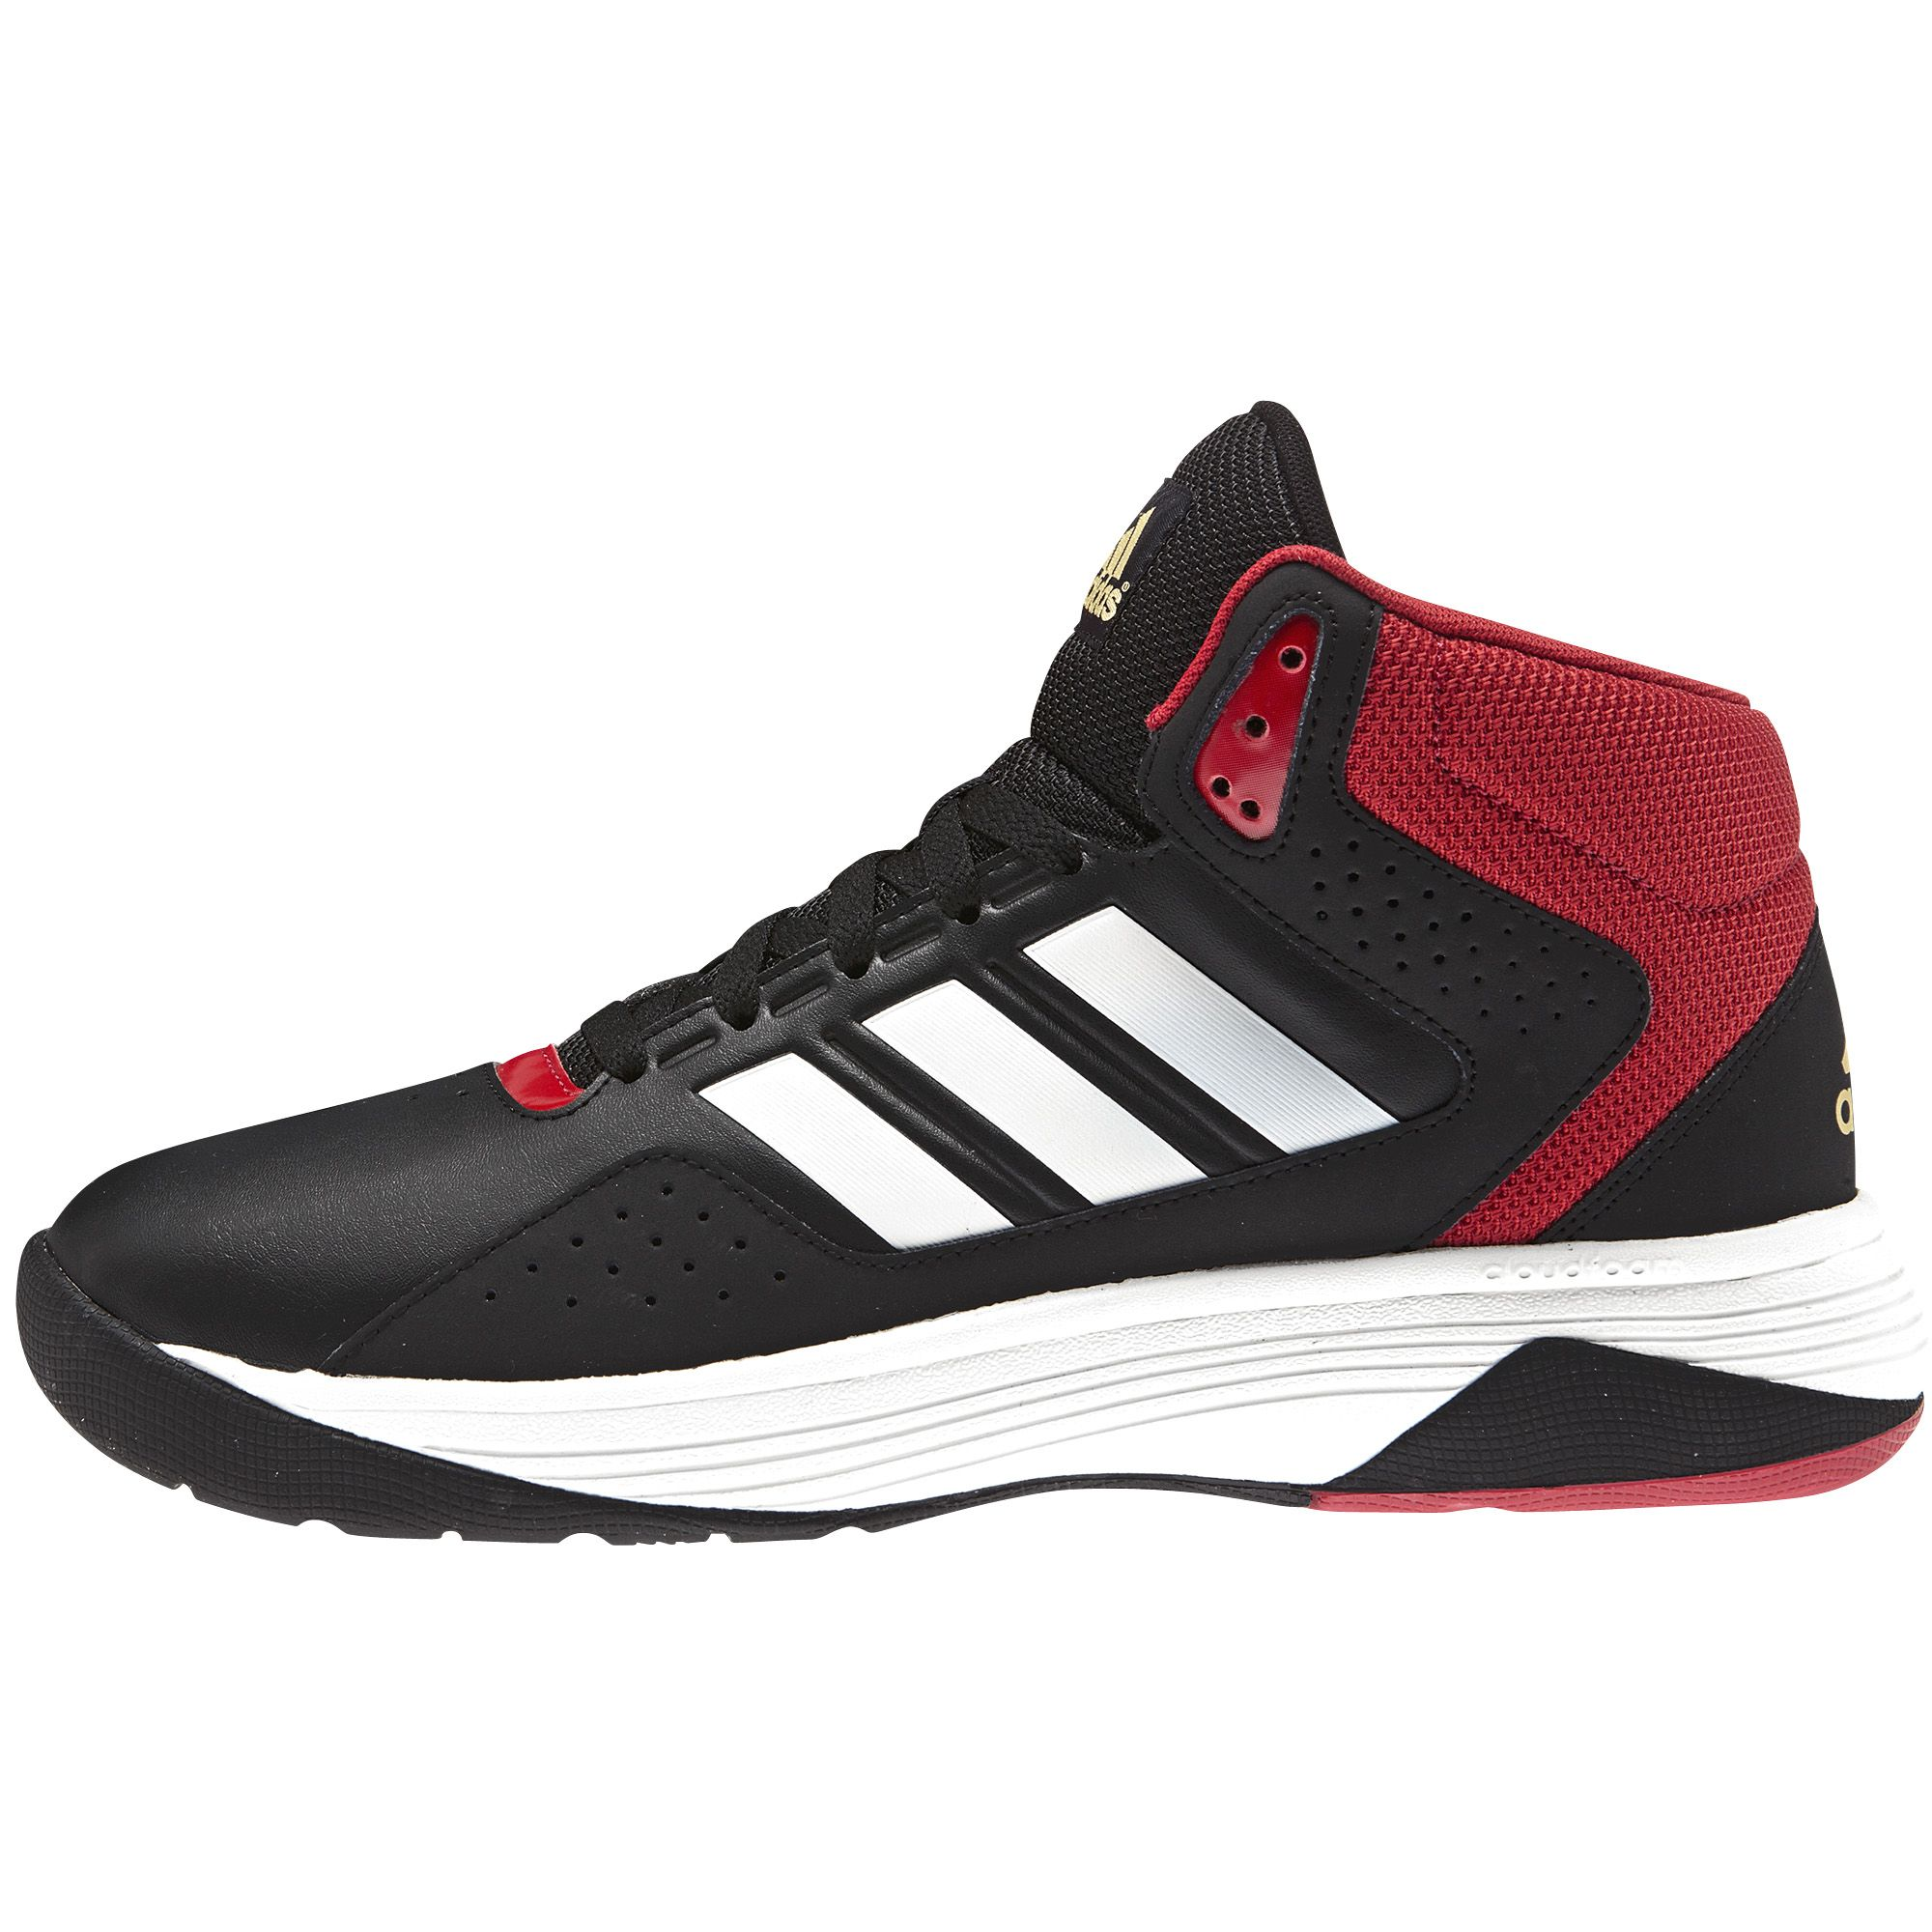 adidas Men's Cloudfoam Ilation Mid Basketball Shoe - Black/White